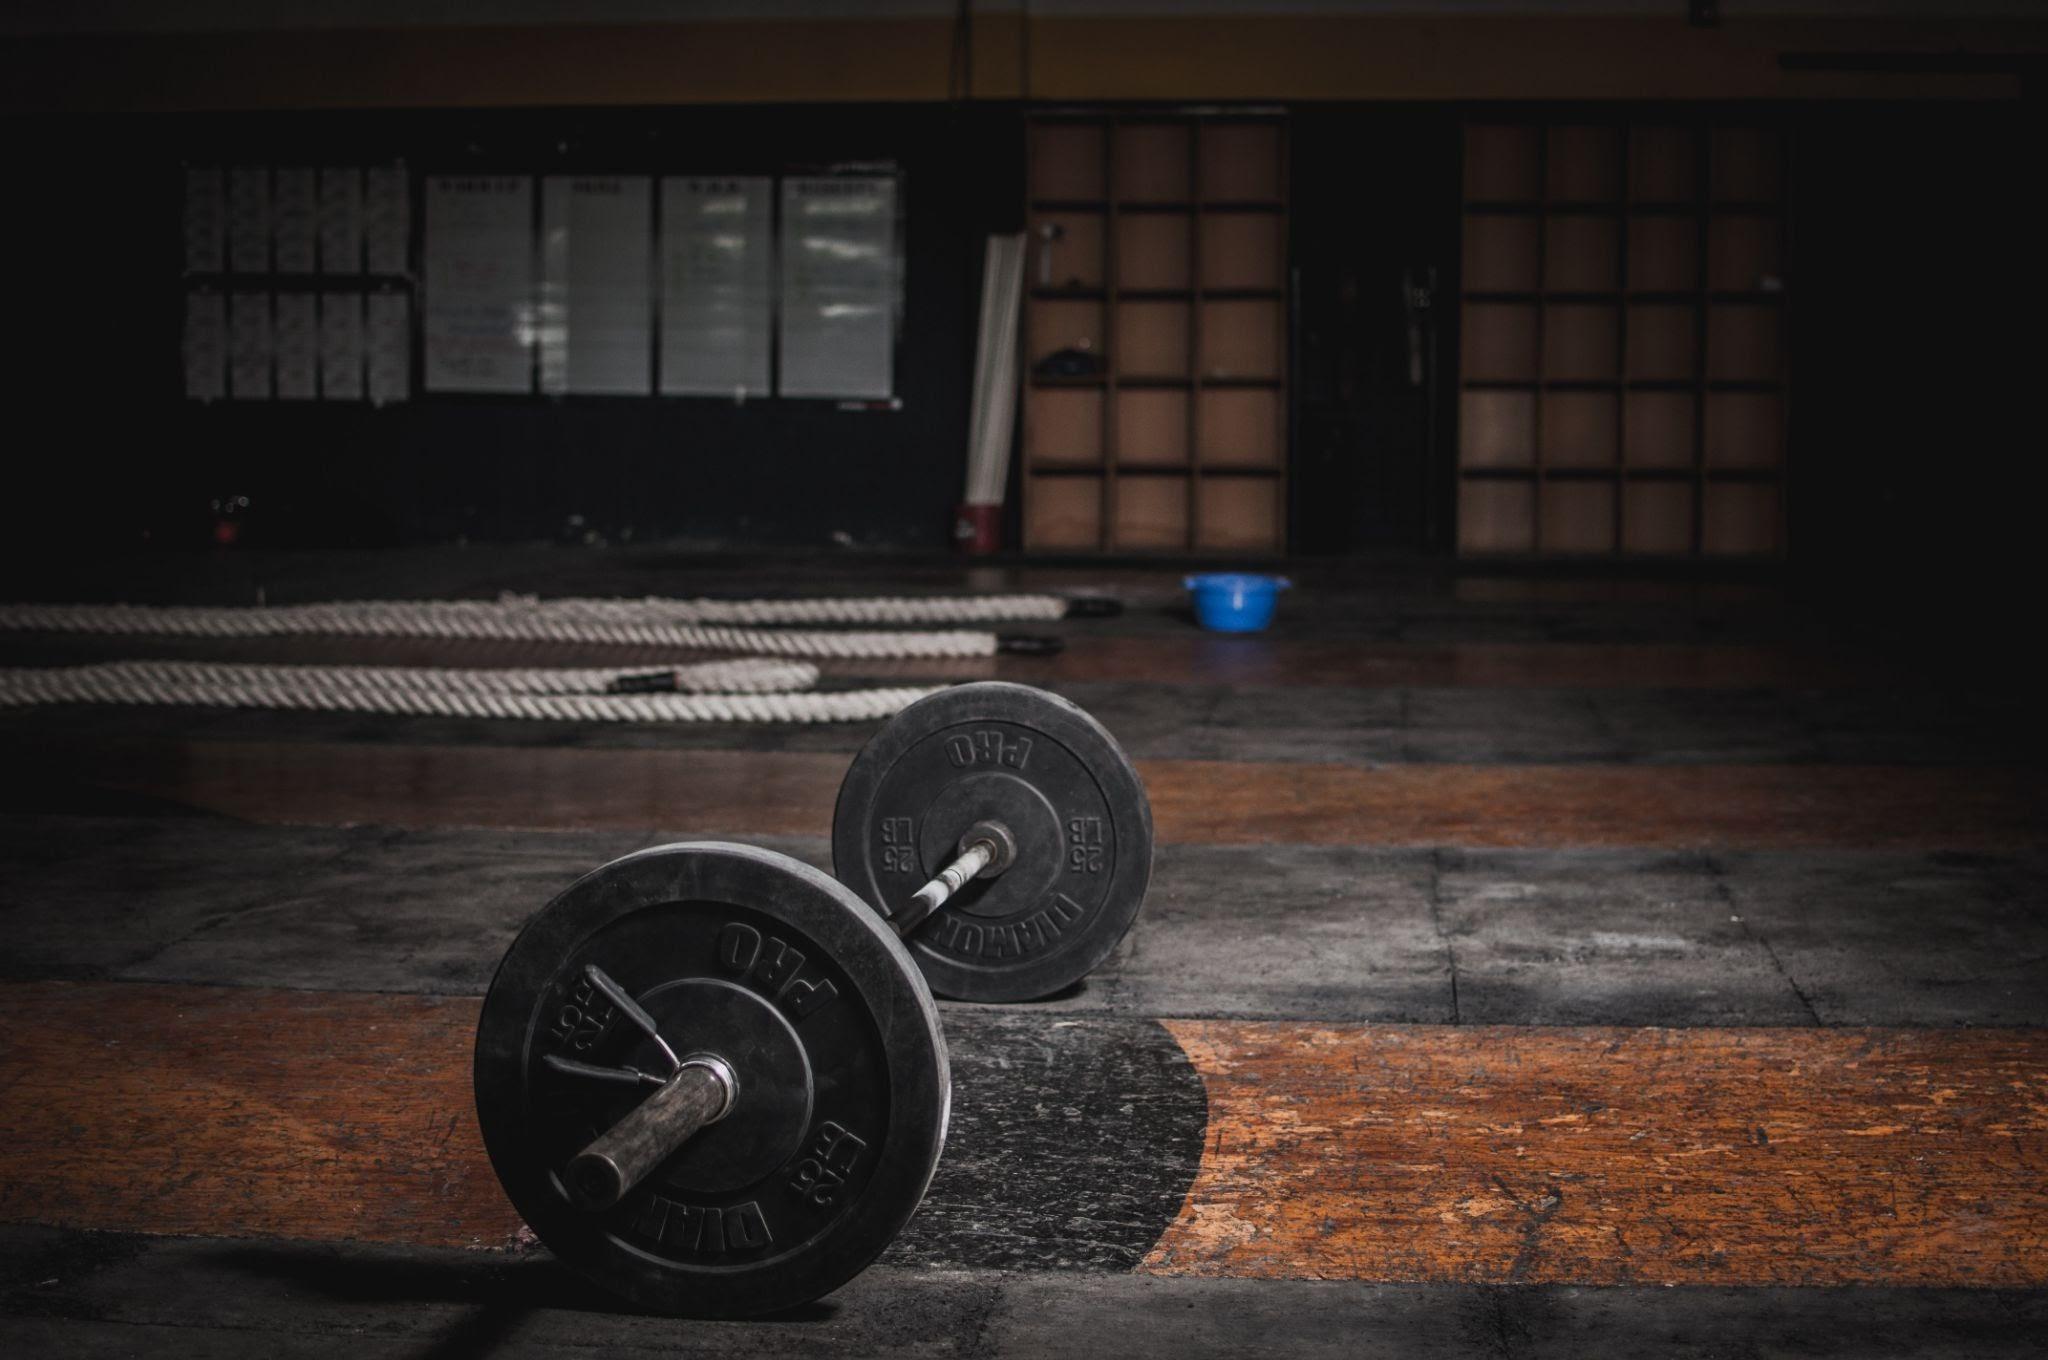 Weight bar on gym floor